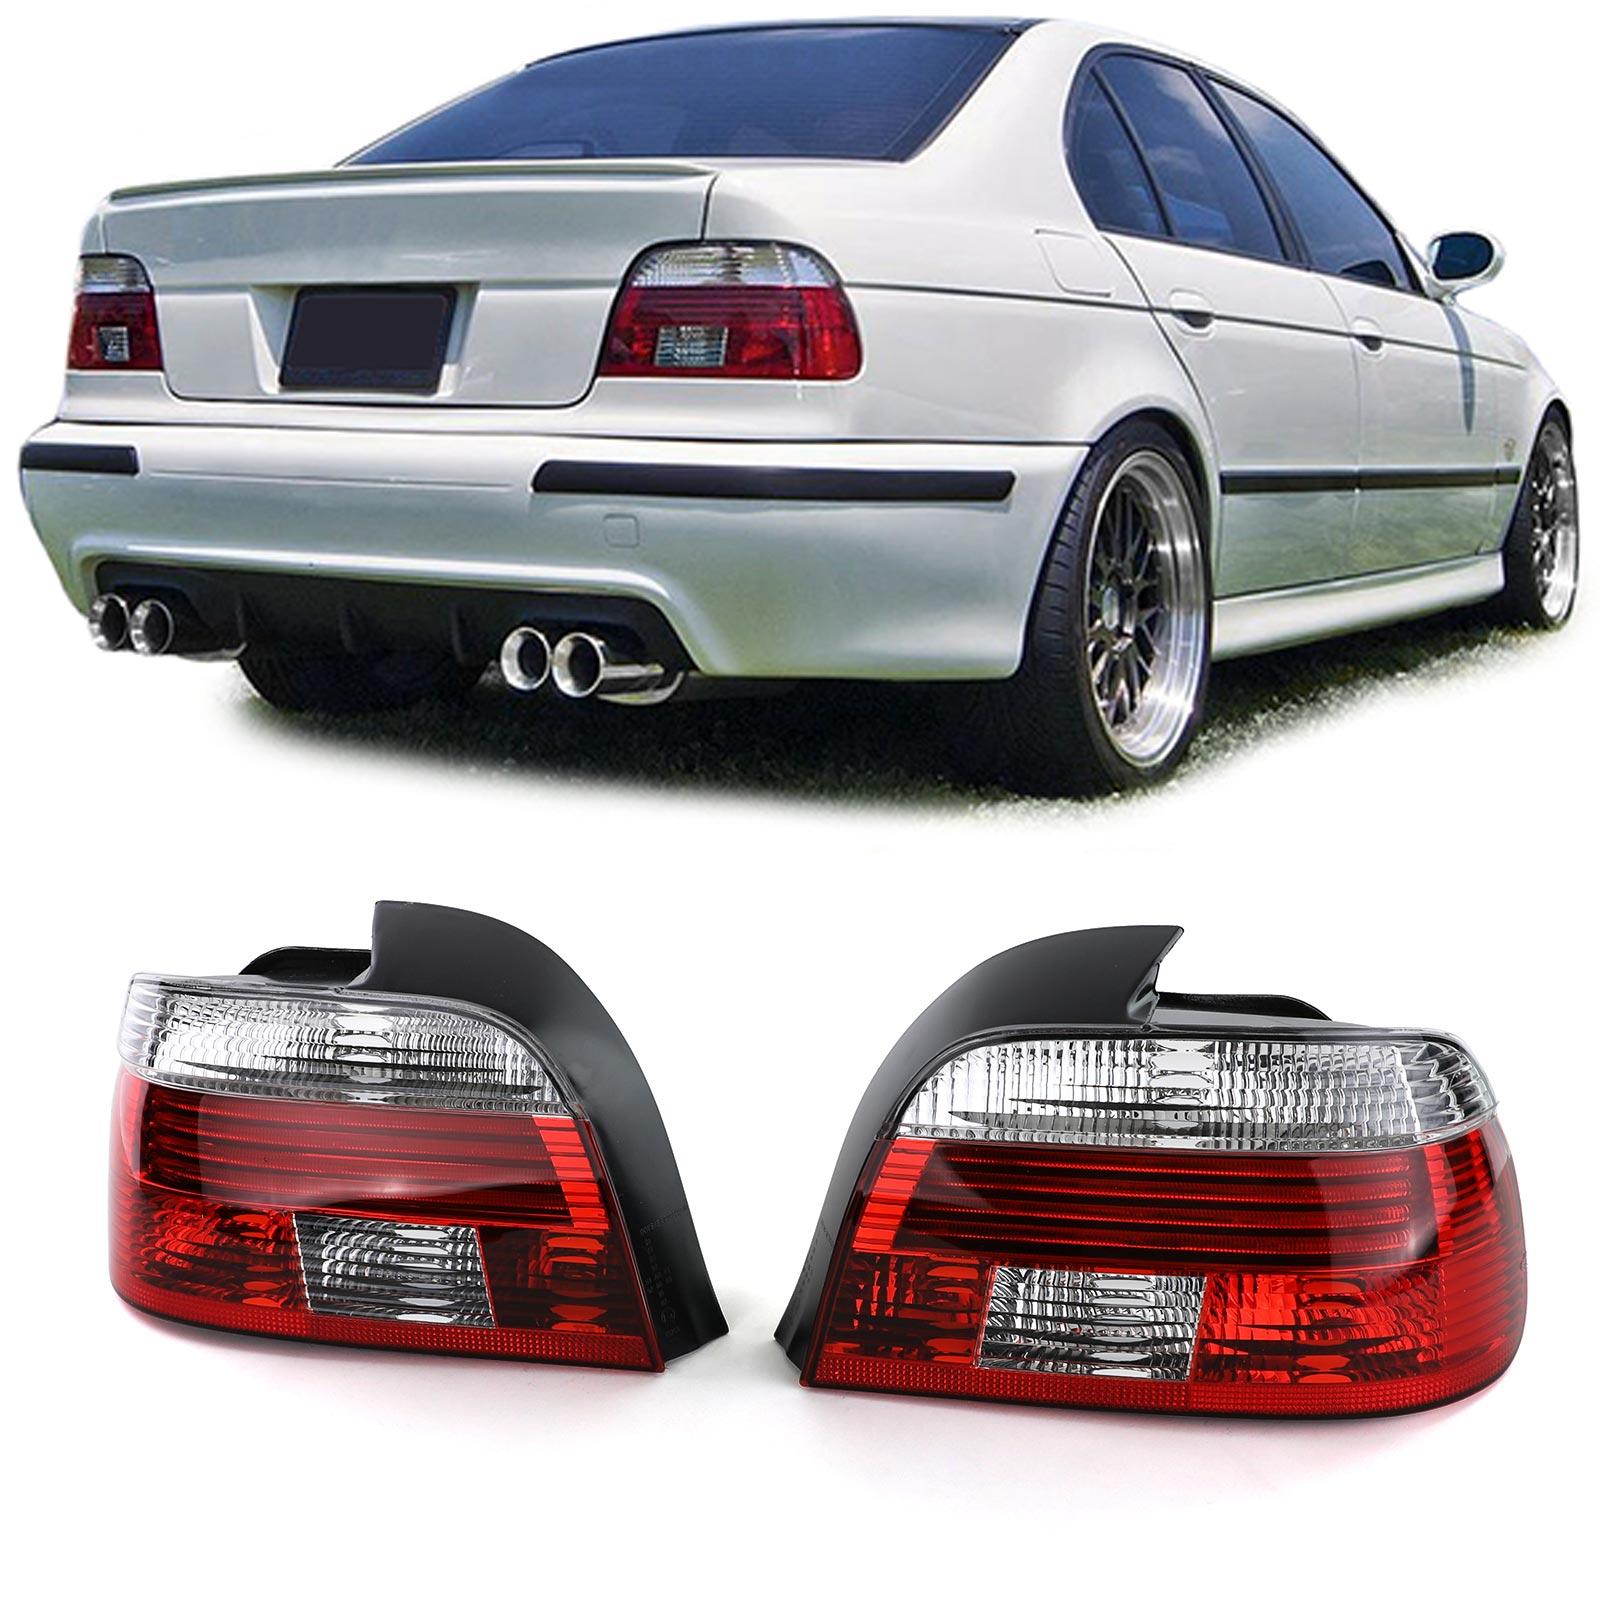 BMW E39 2000-2003 farolins cristal